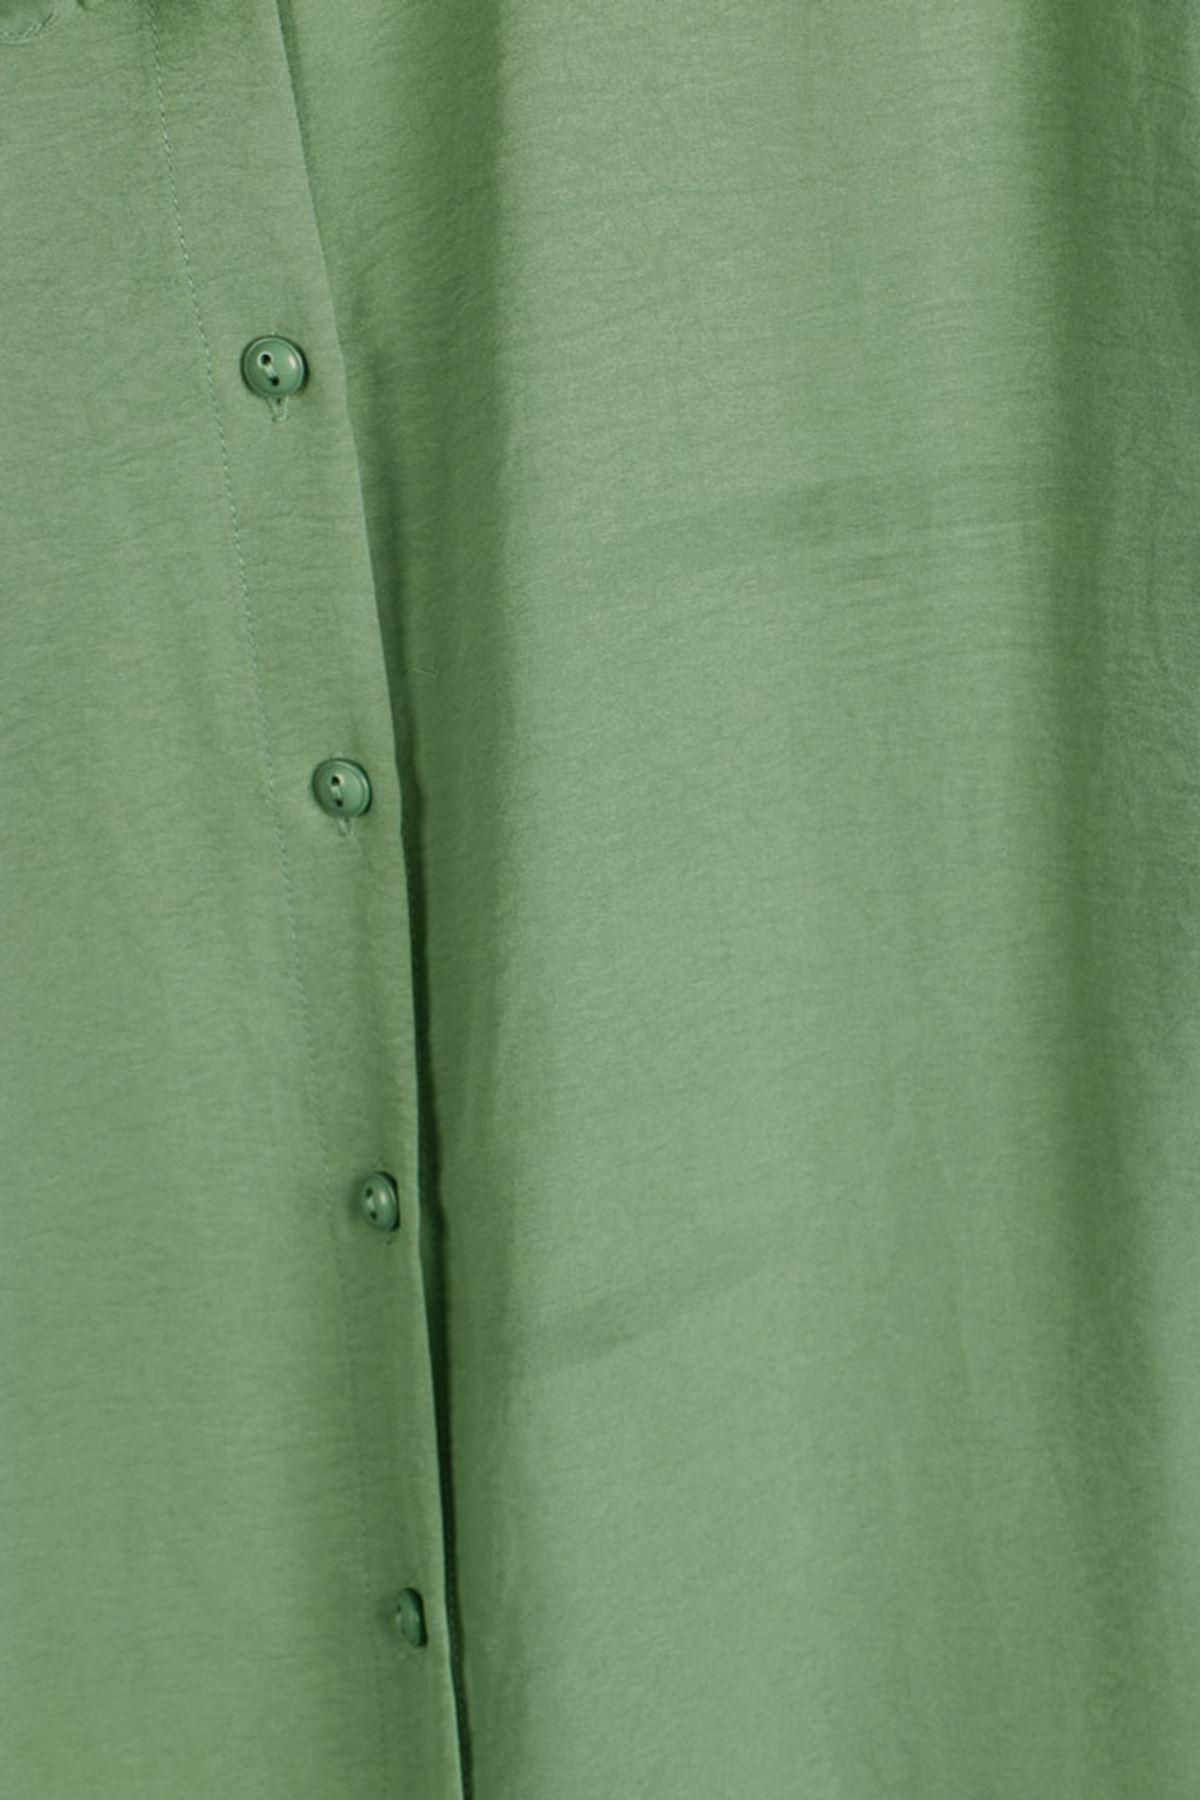 8458 Oversized Buttoned Shirt - Naphtha Green